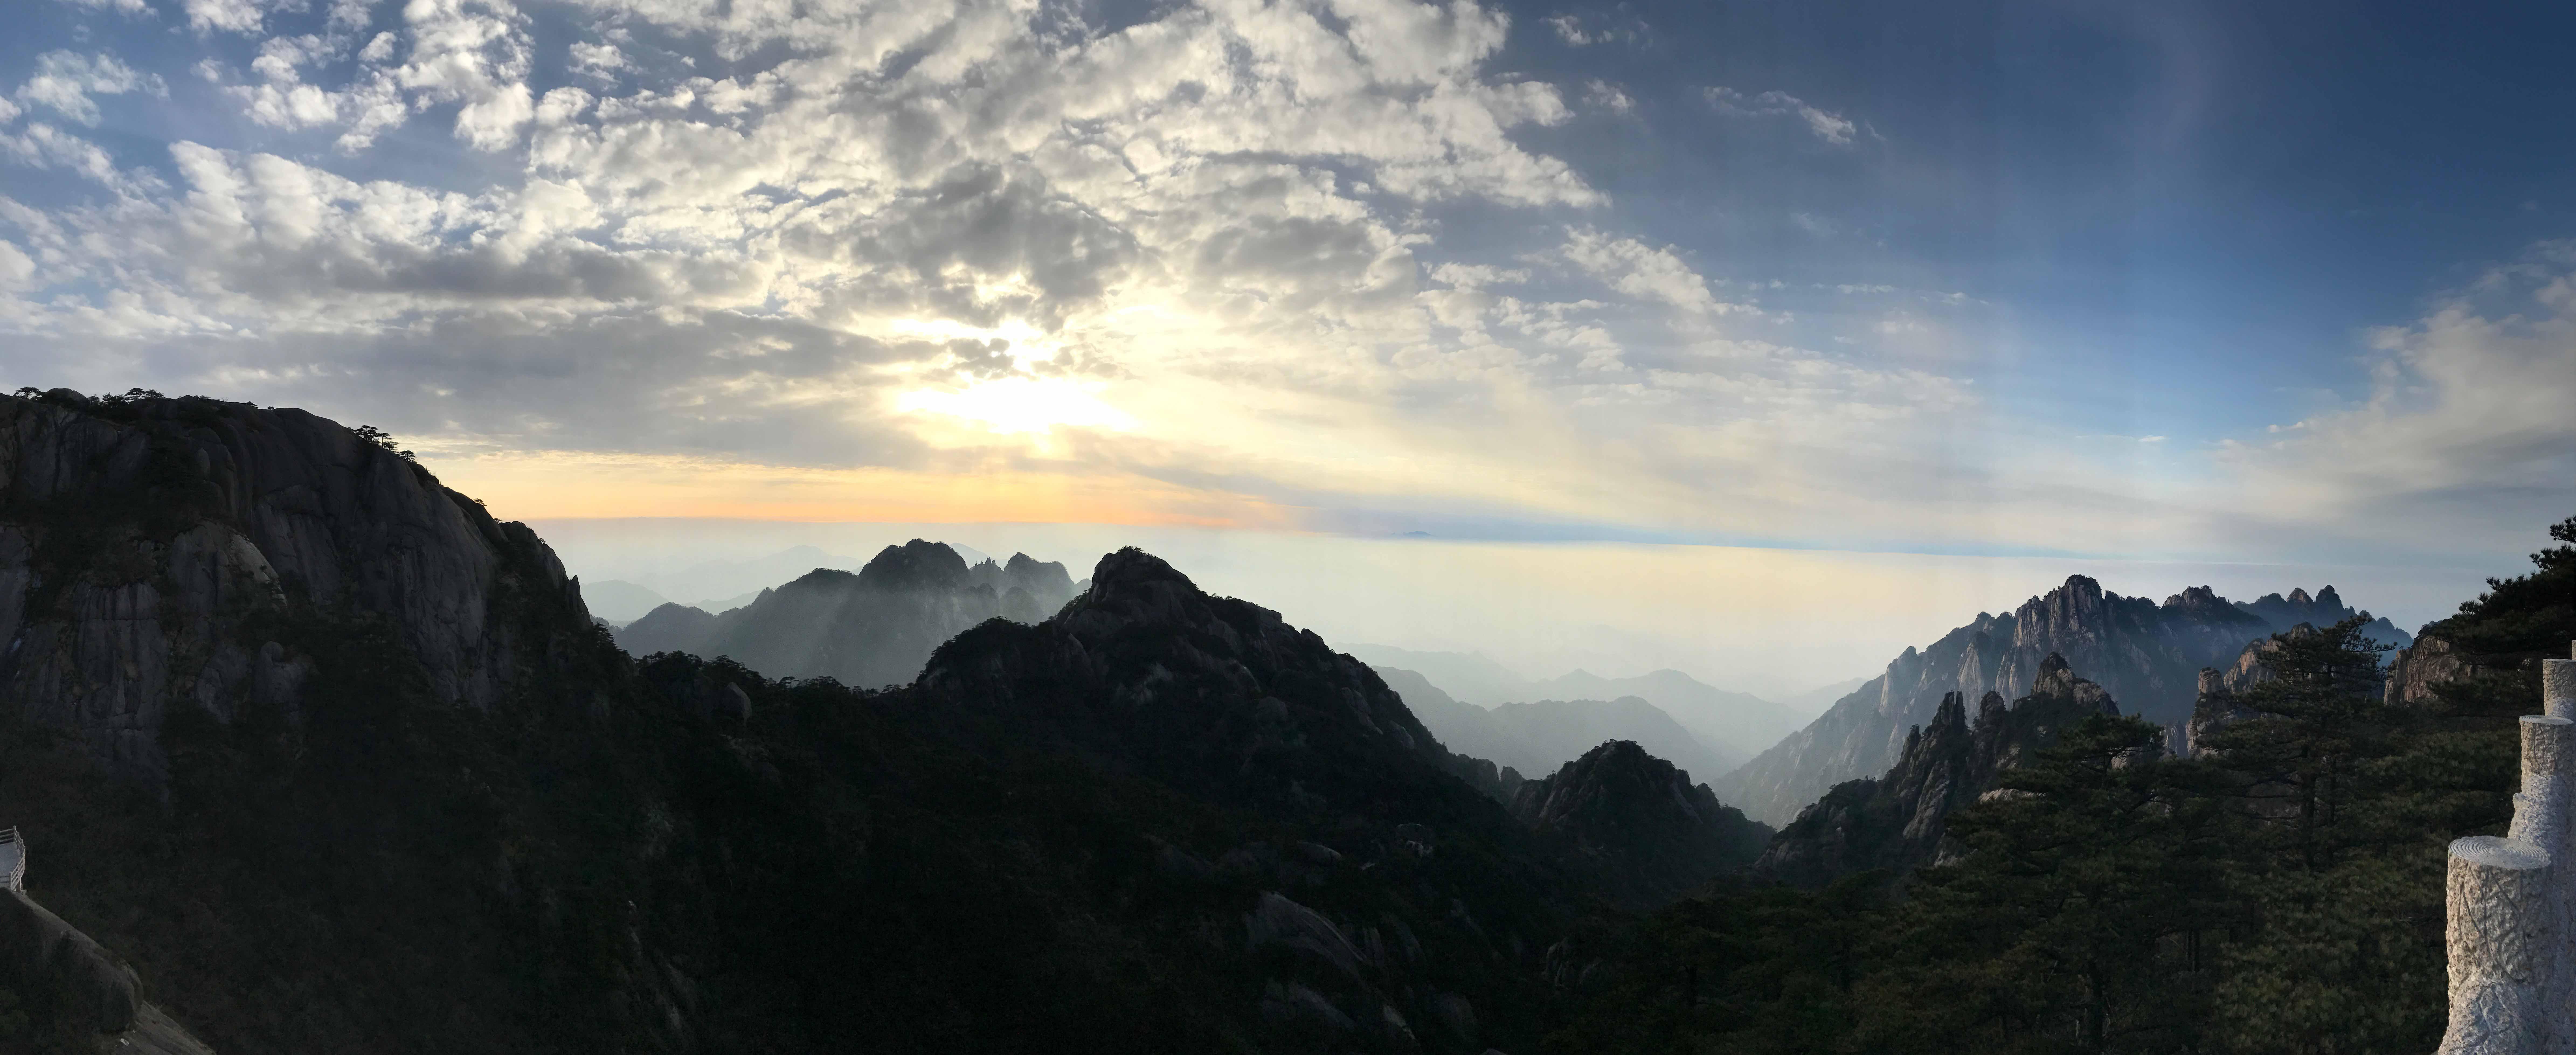 Huang-Shan-Panorama-01